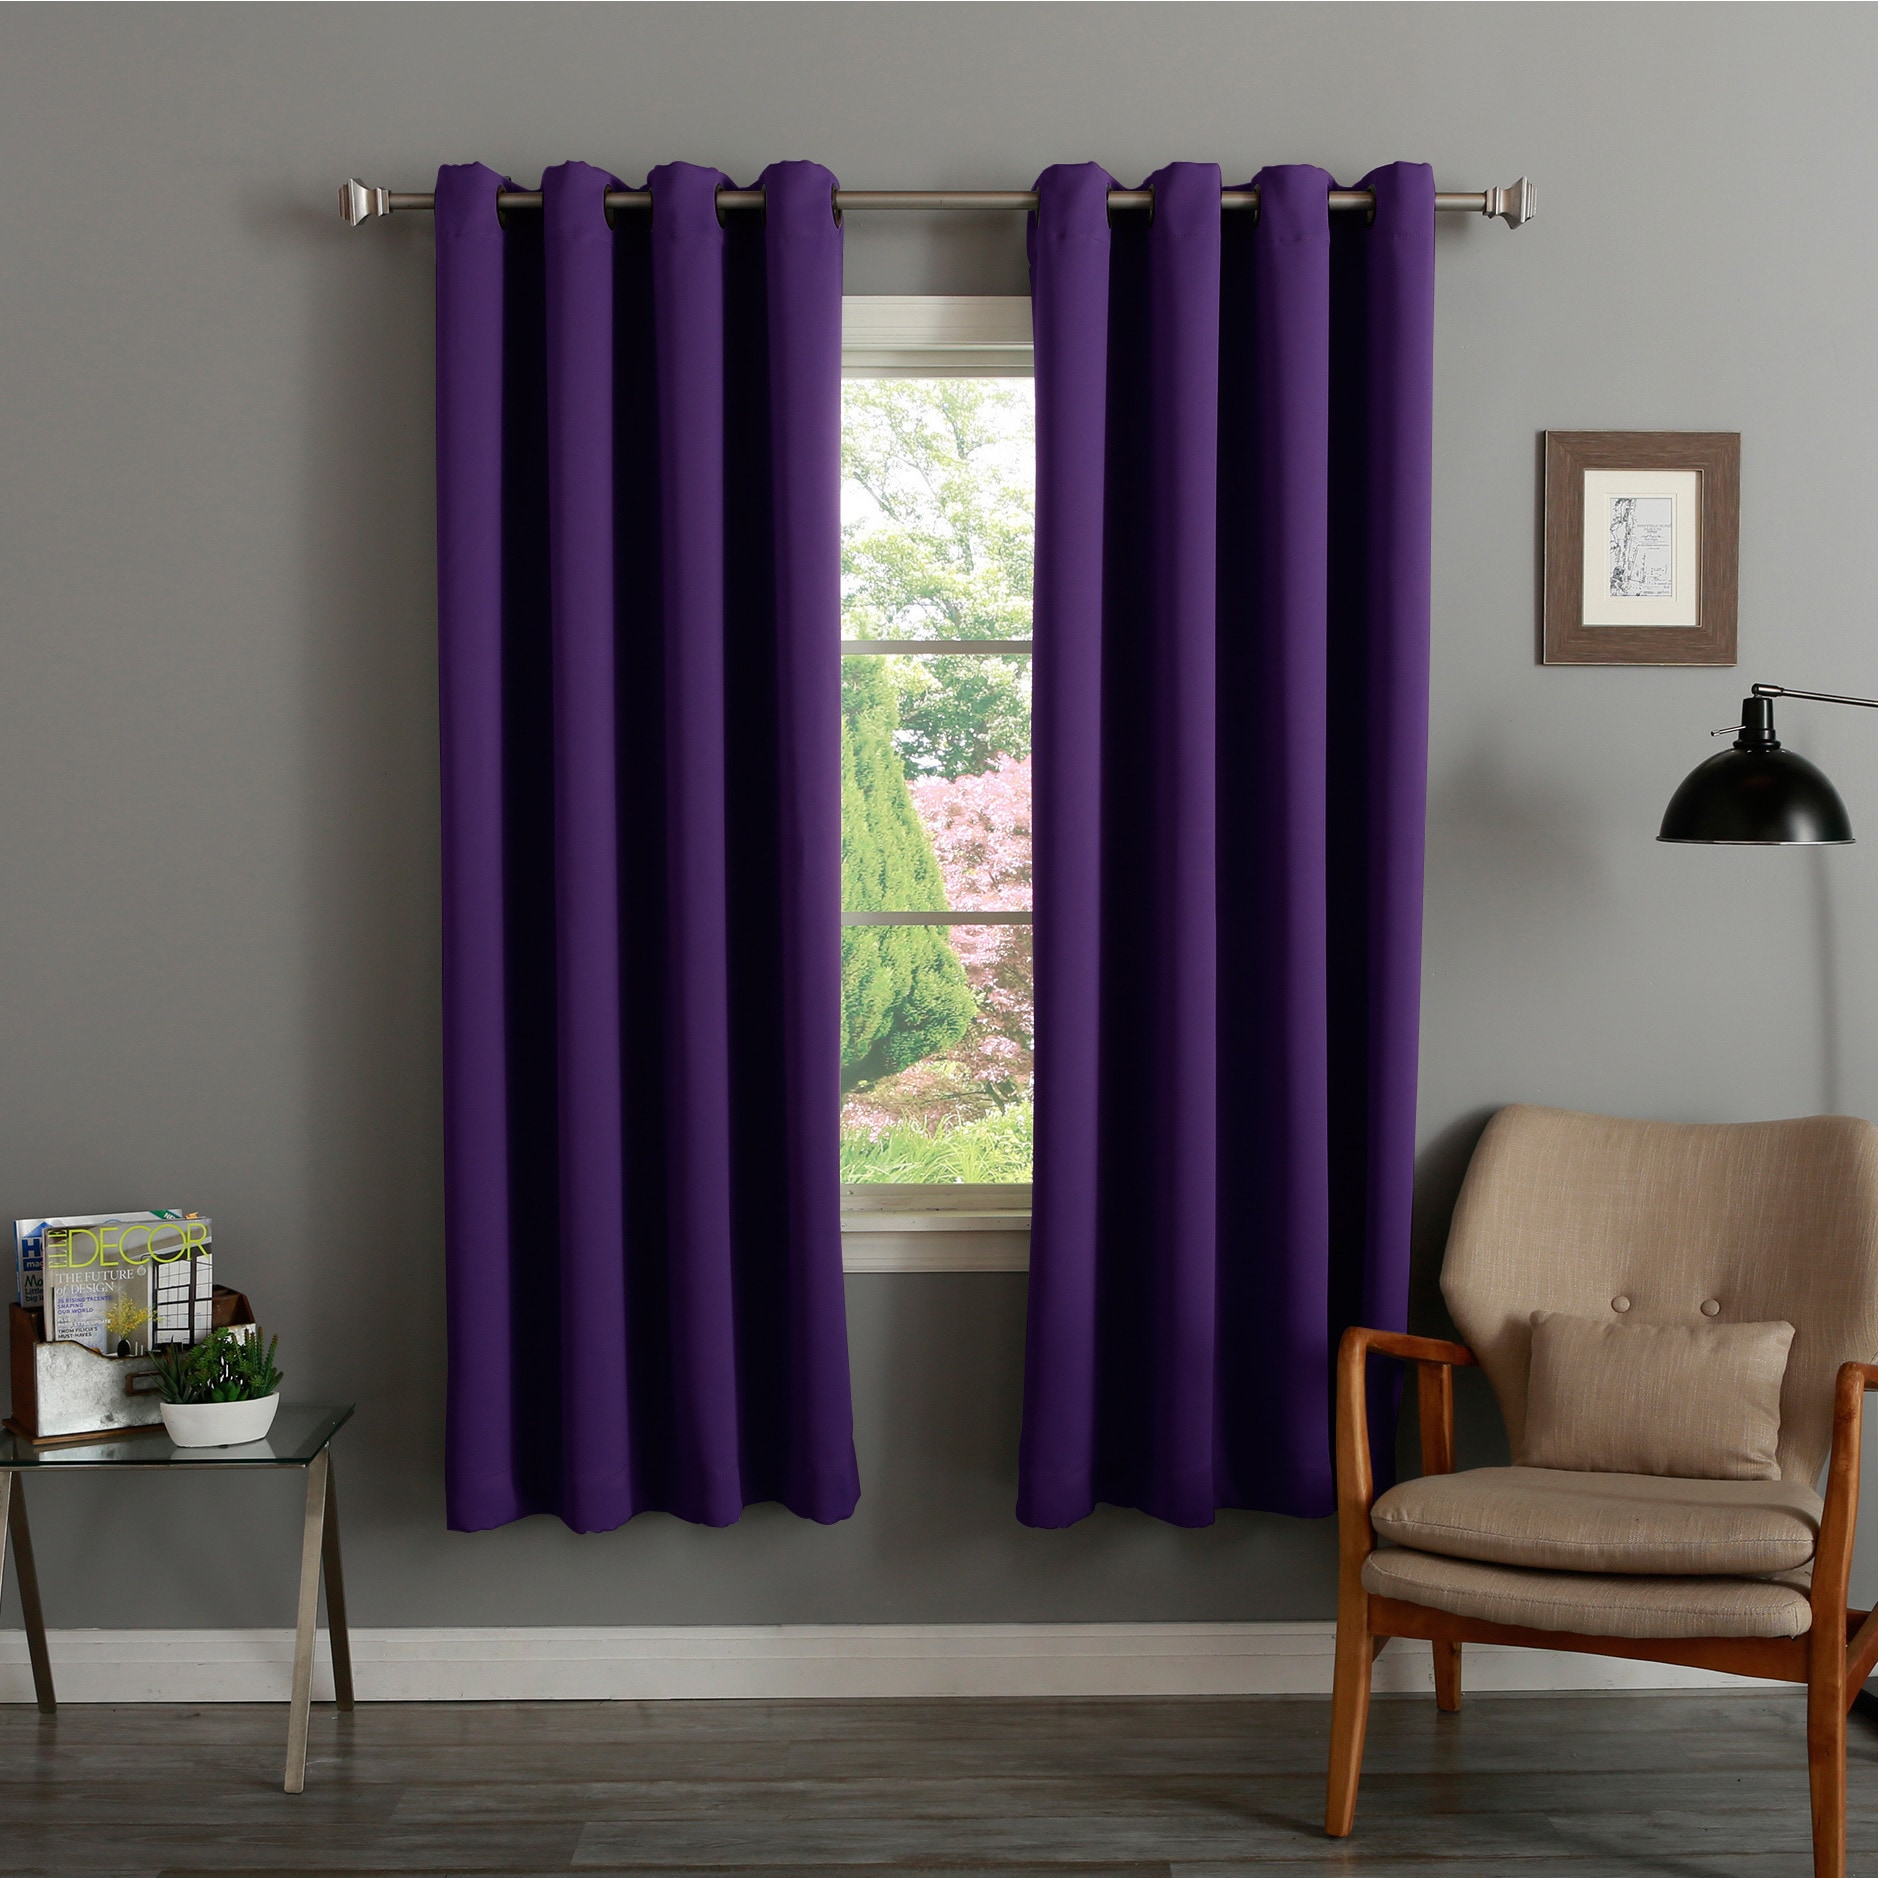 Purple Curtains D Online At Our Best Window Treatments Deals